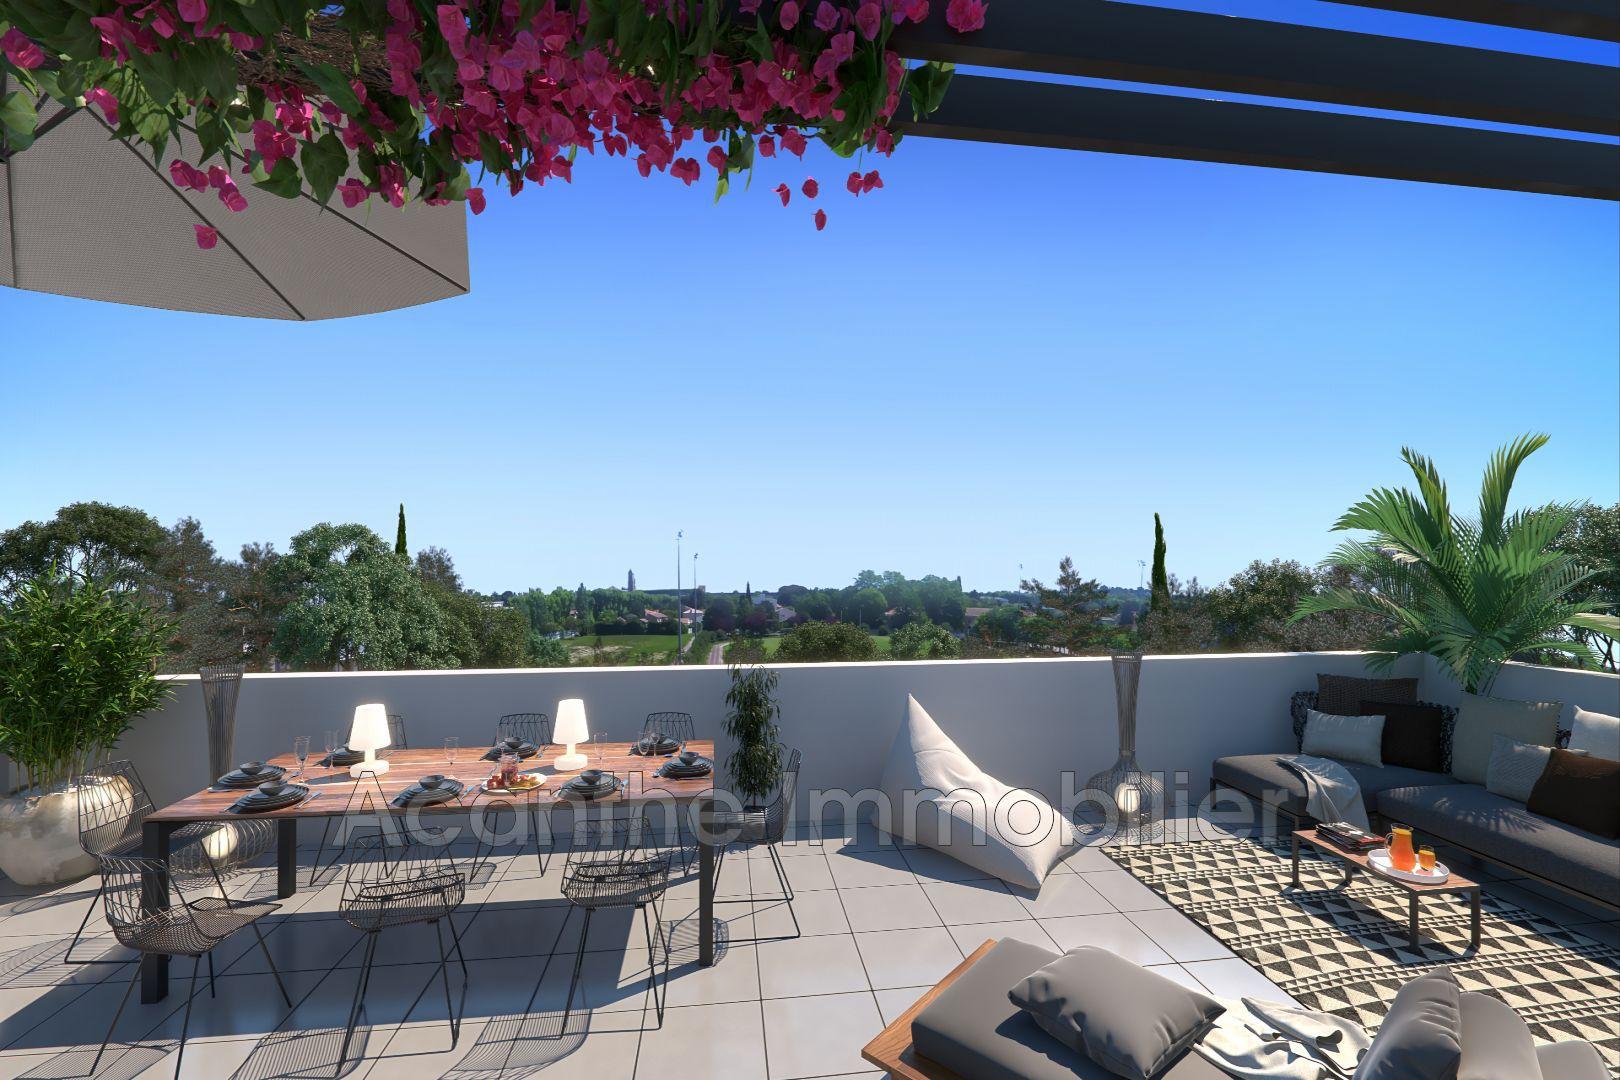 Vente appartement montpellier 34000 790 000 for Montpellier 34000